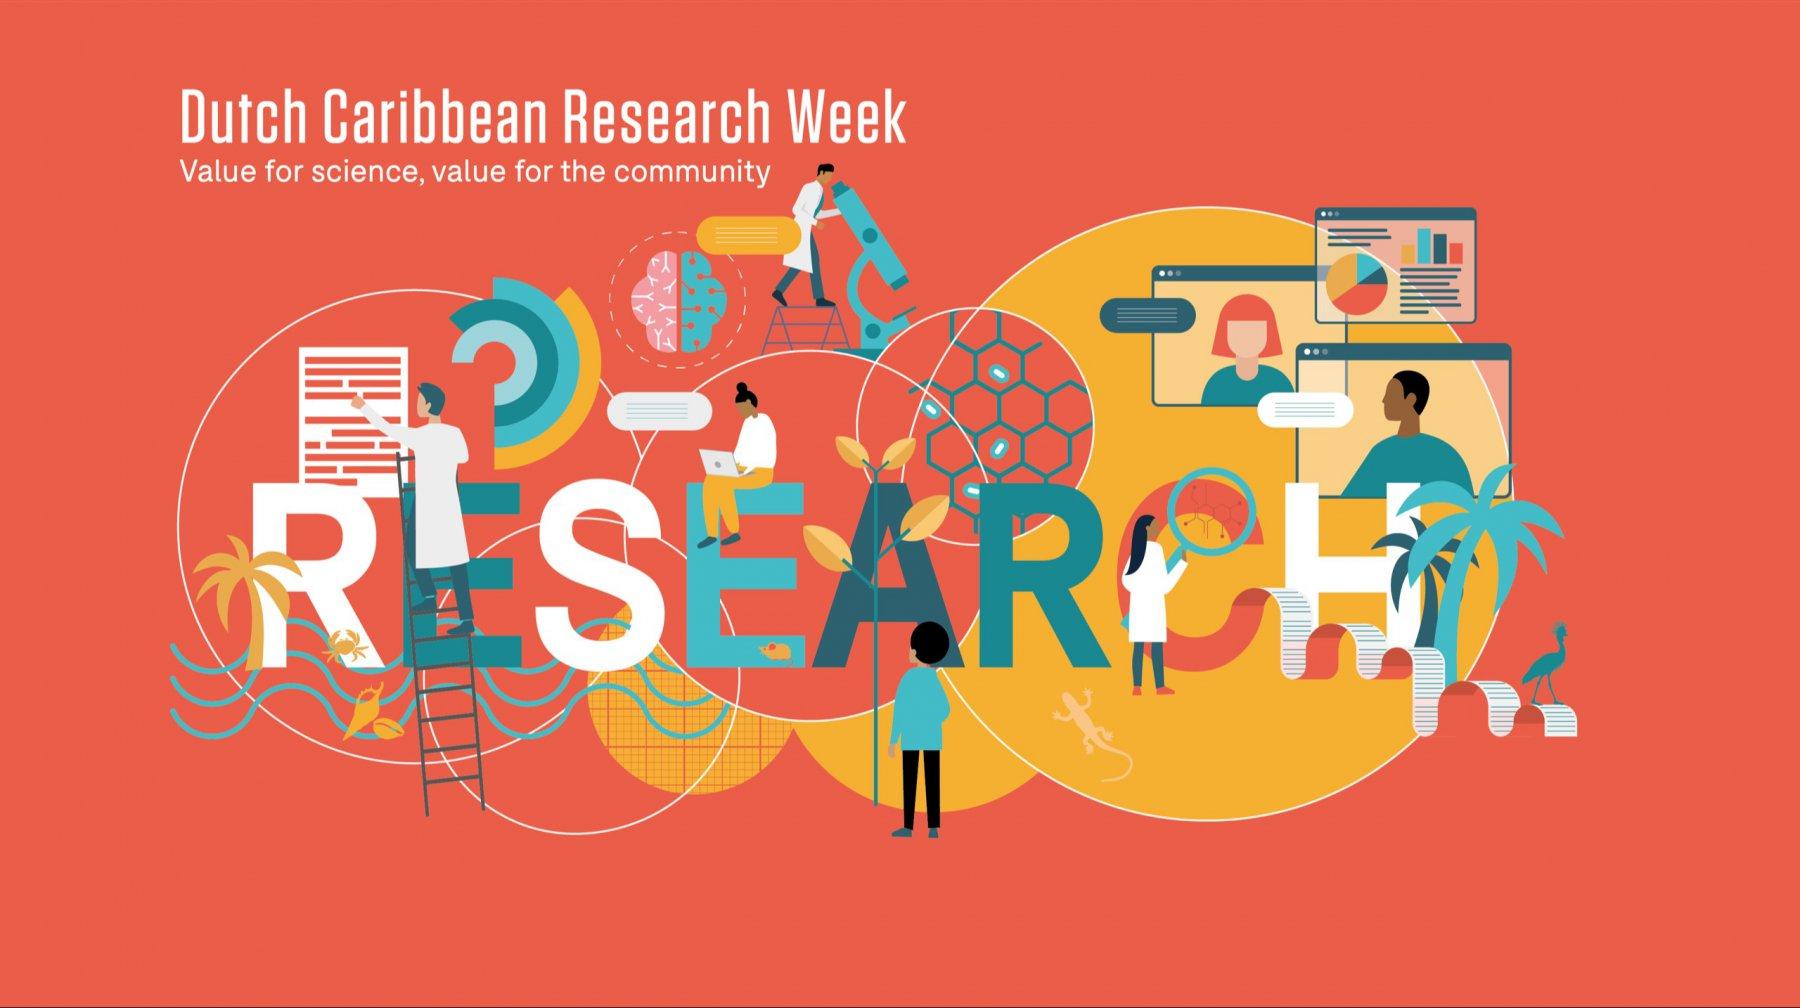 Dutch Caribbean Research Week